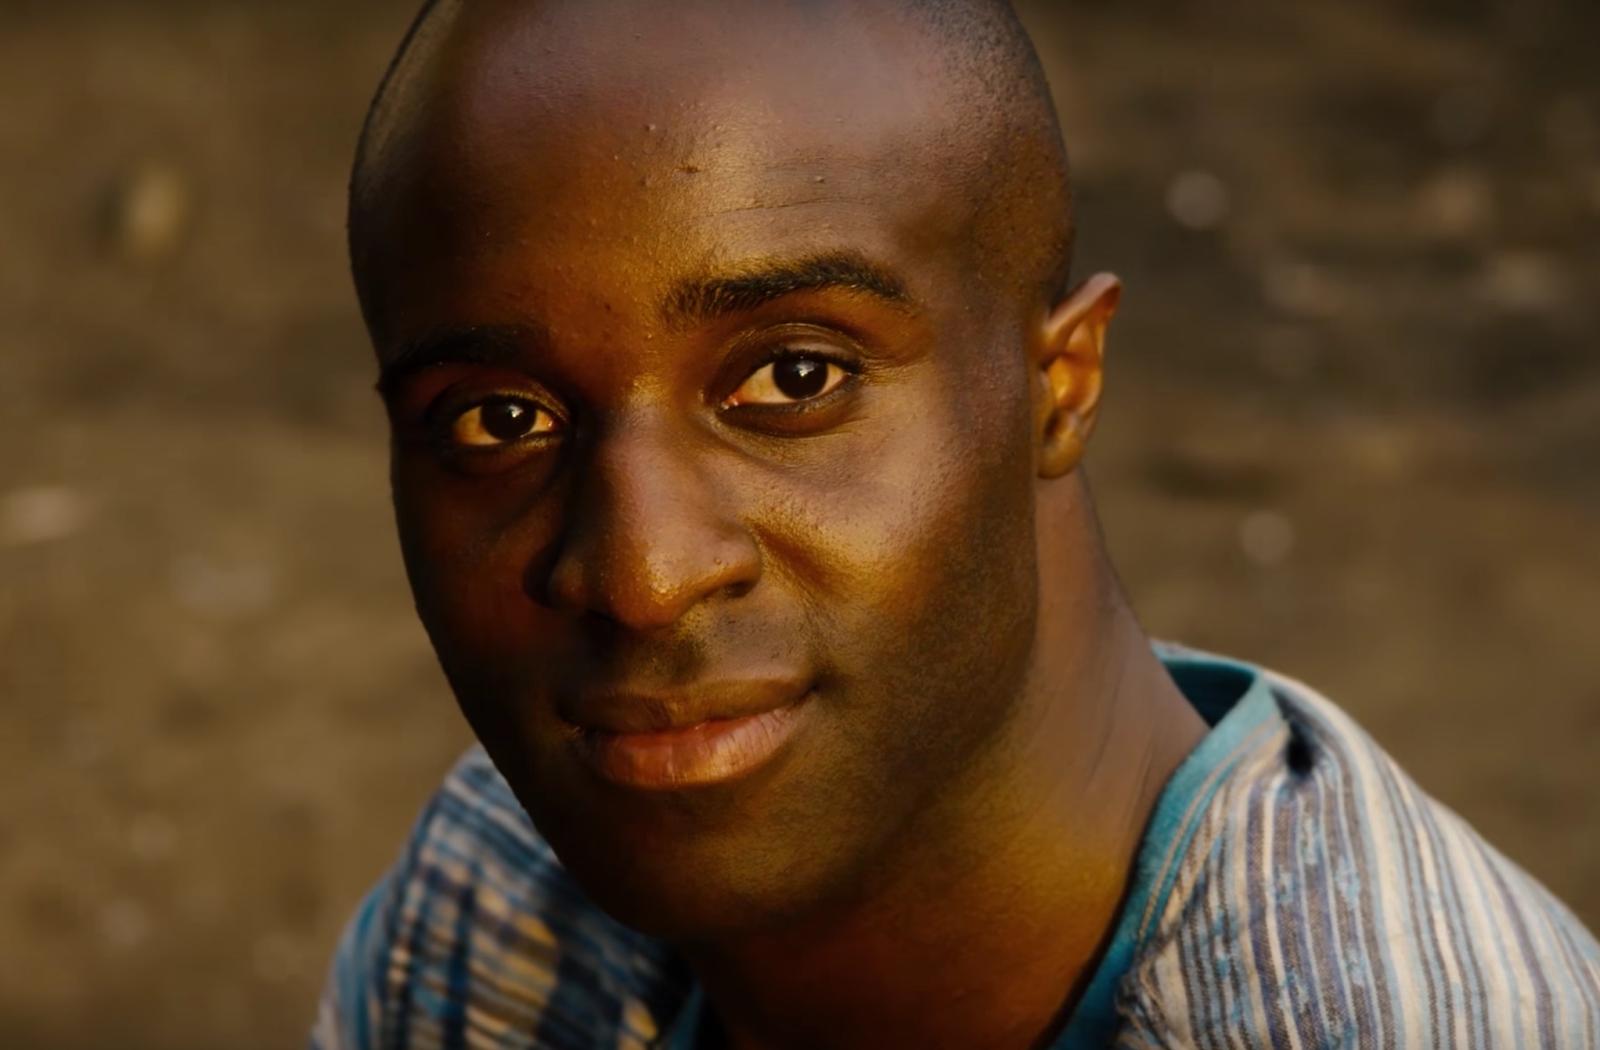 Toby Onwumere interpreta a Capheus